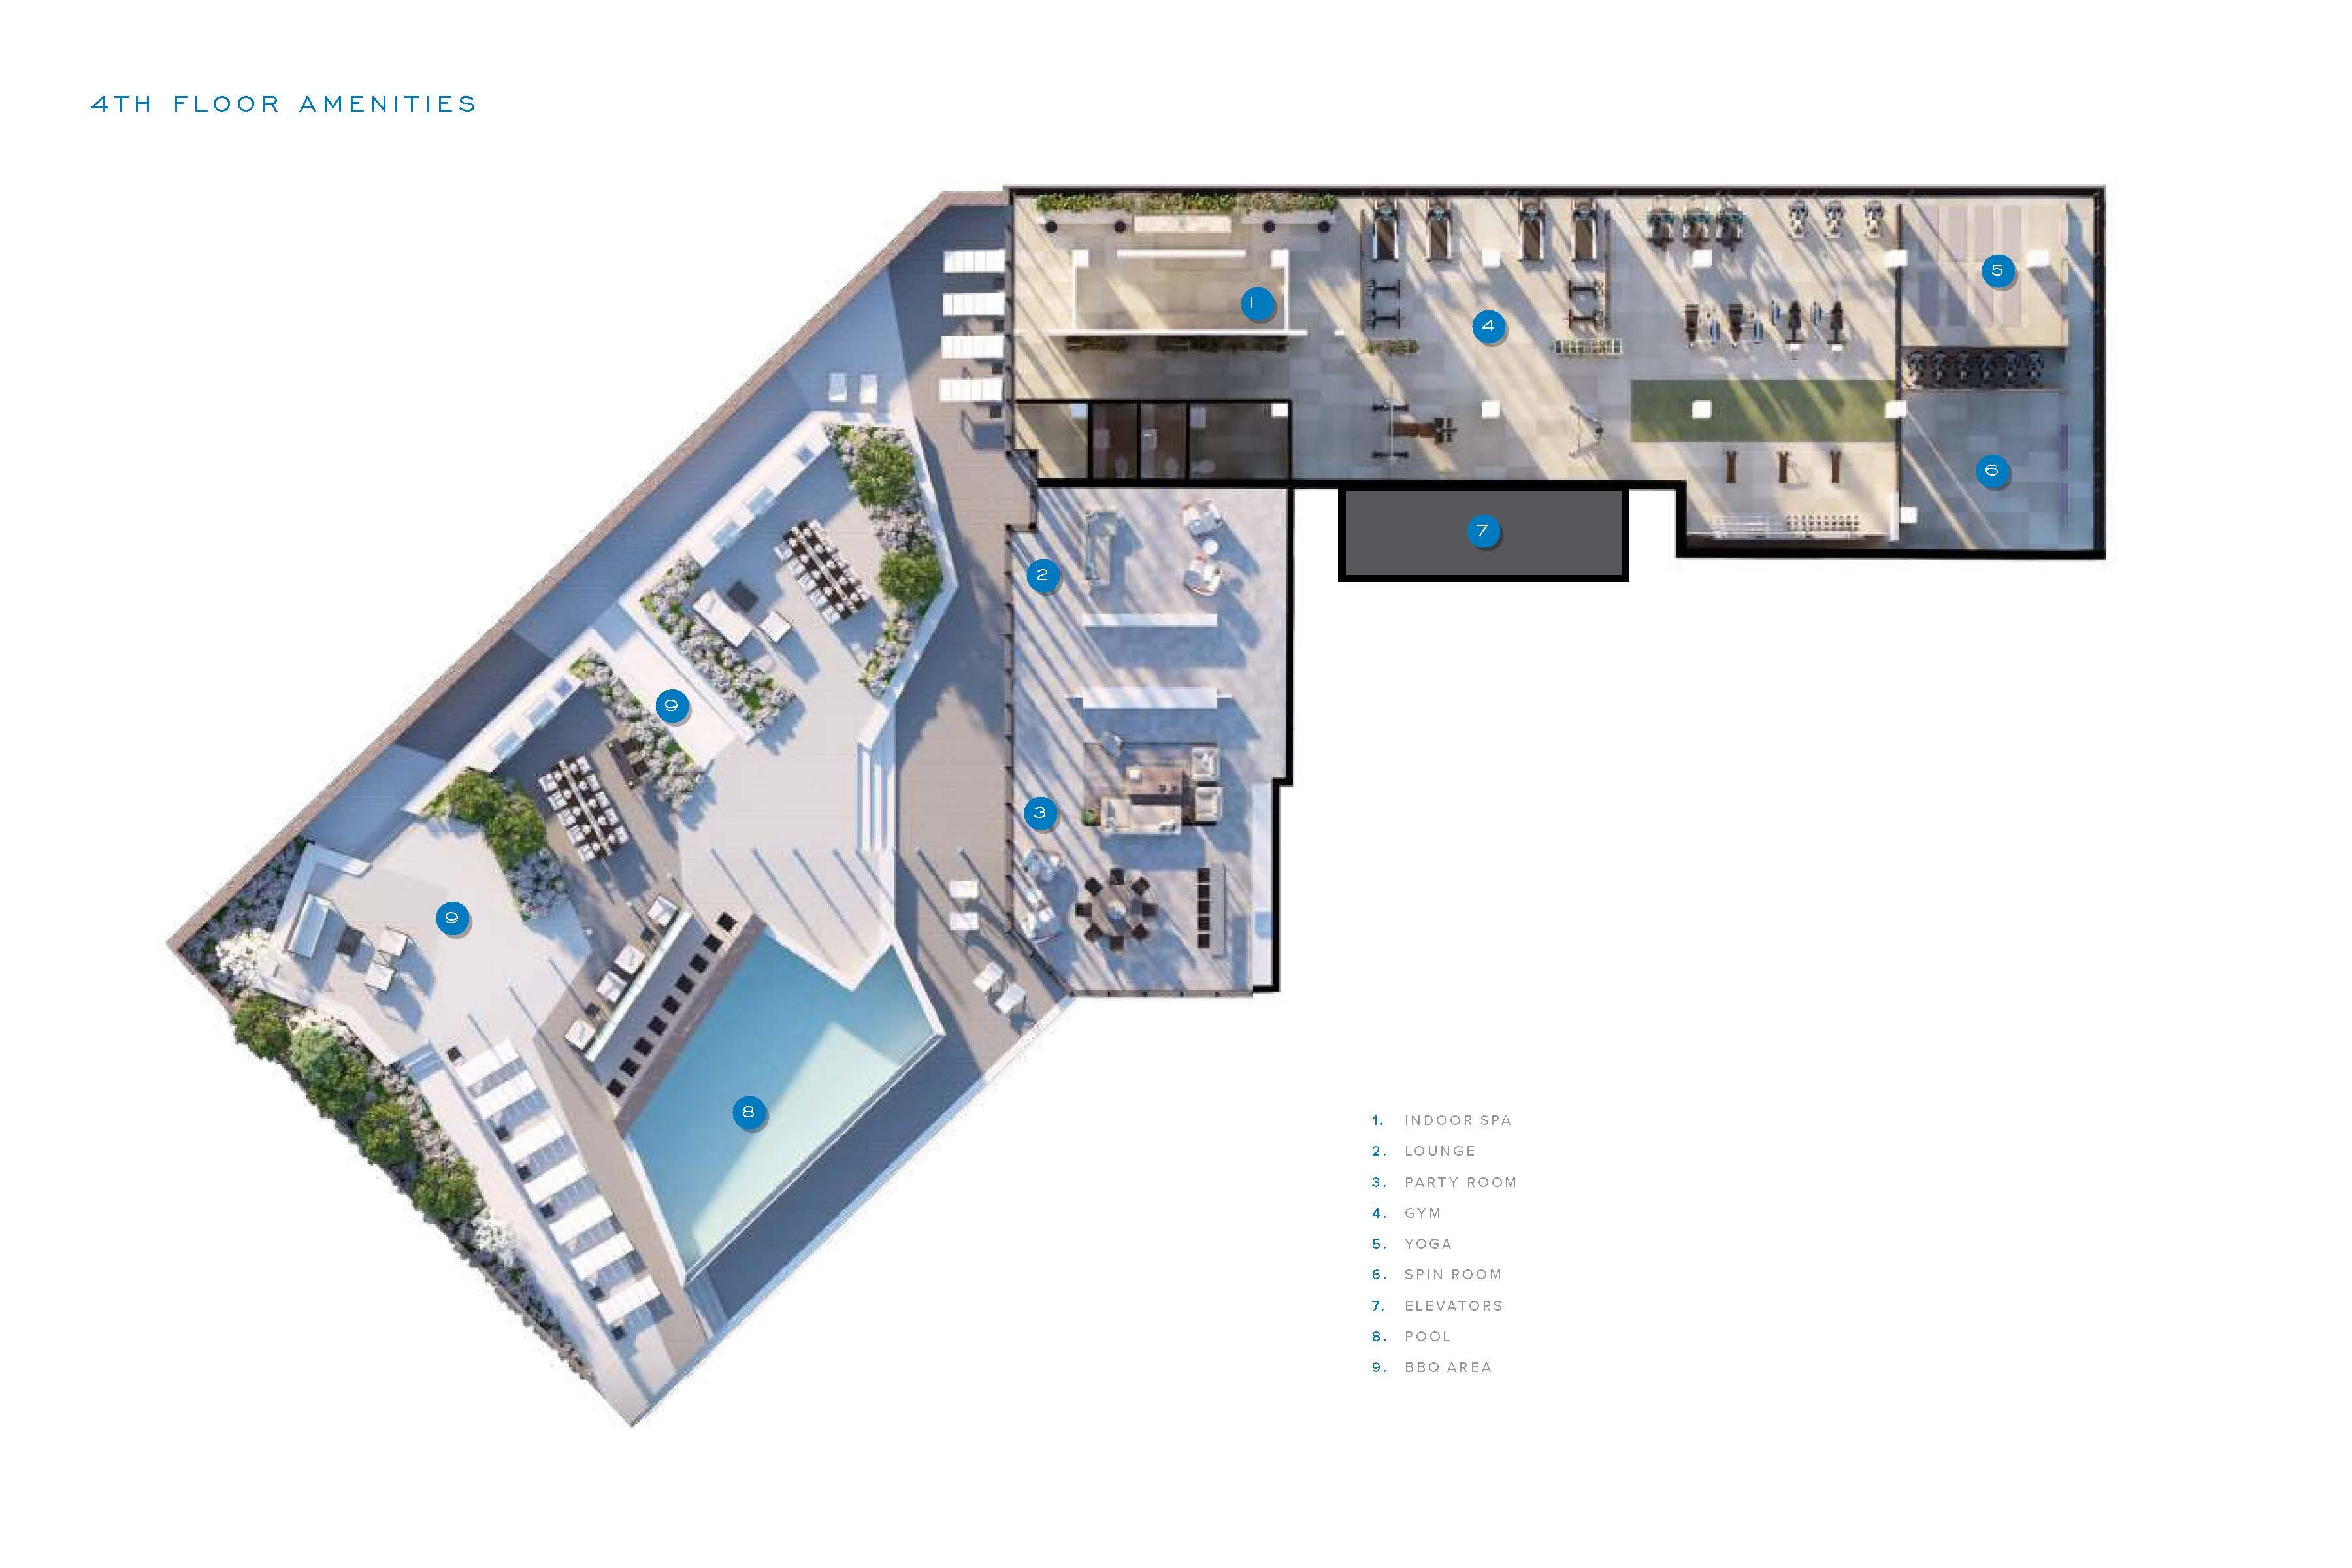 SXSW 2 fourth floor amenity map.